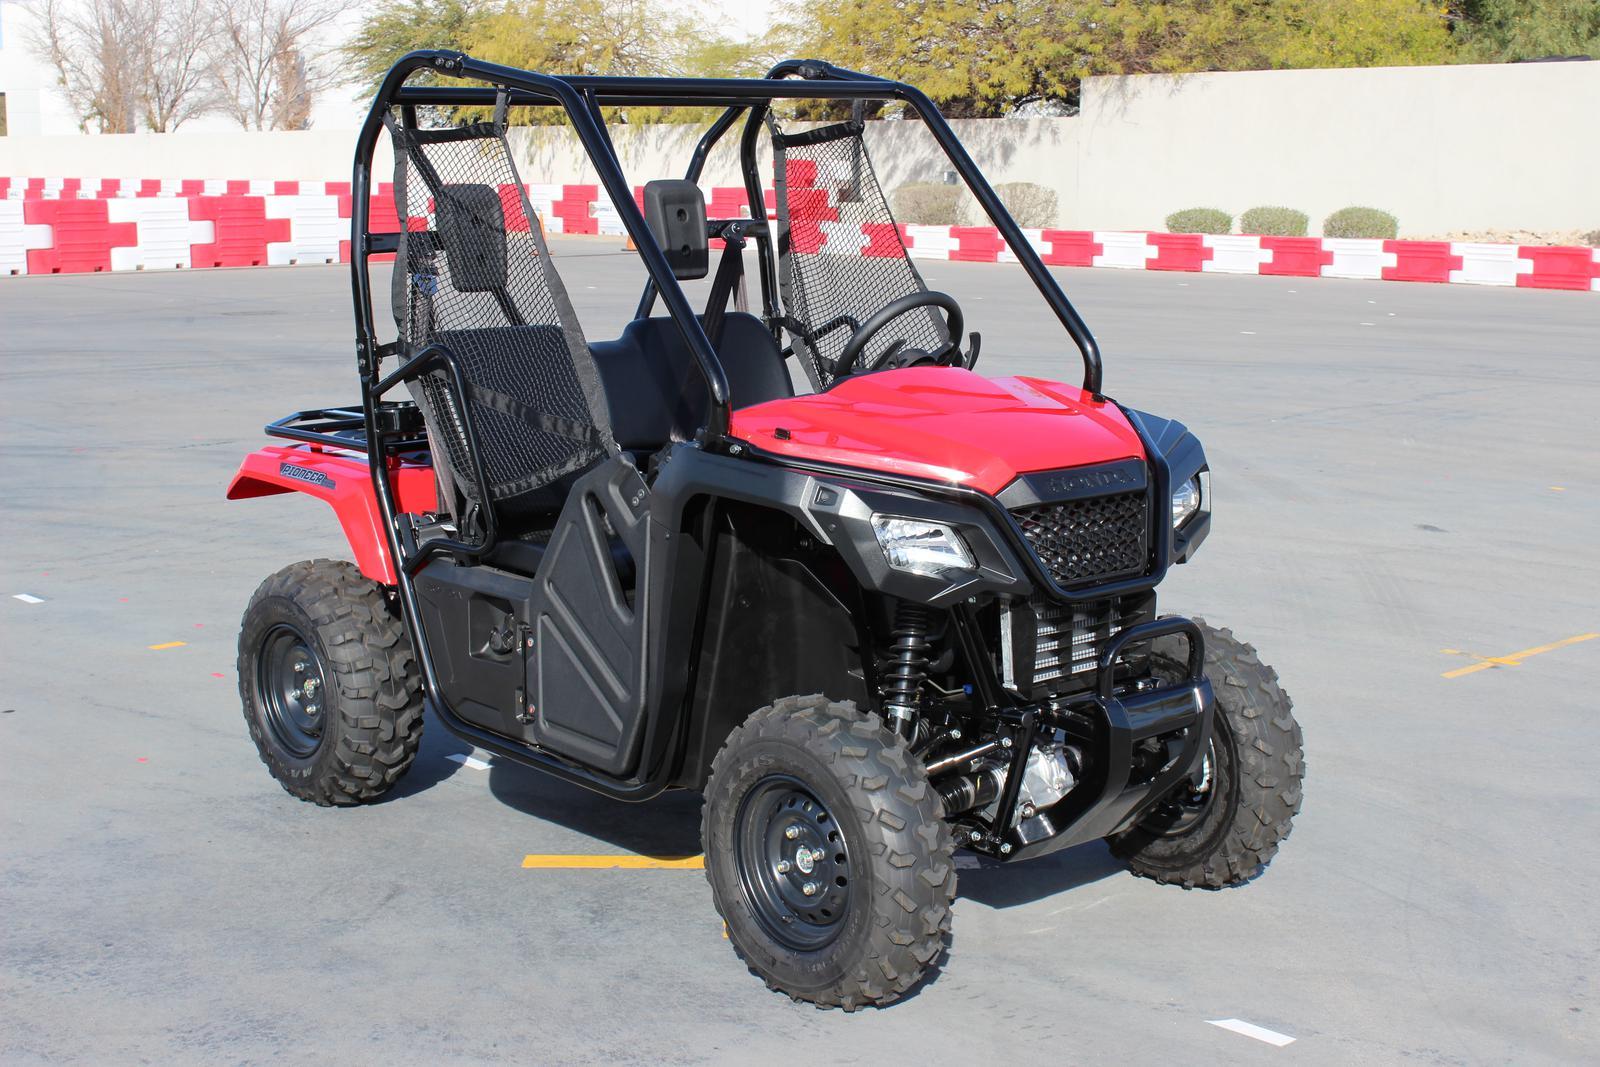 2018 Honda Pioneer 500 For In Scottsdale Az Go Motorcycles 480 609 1800